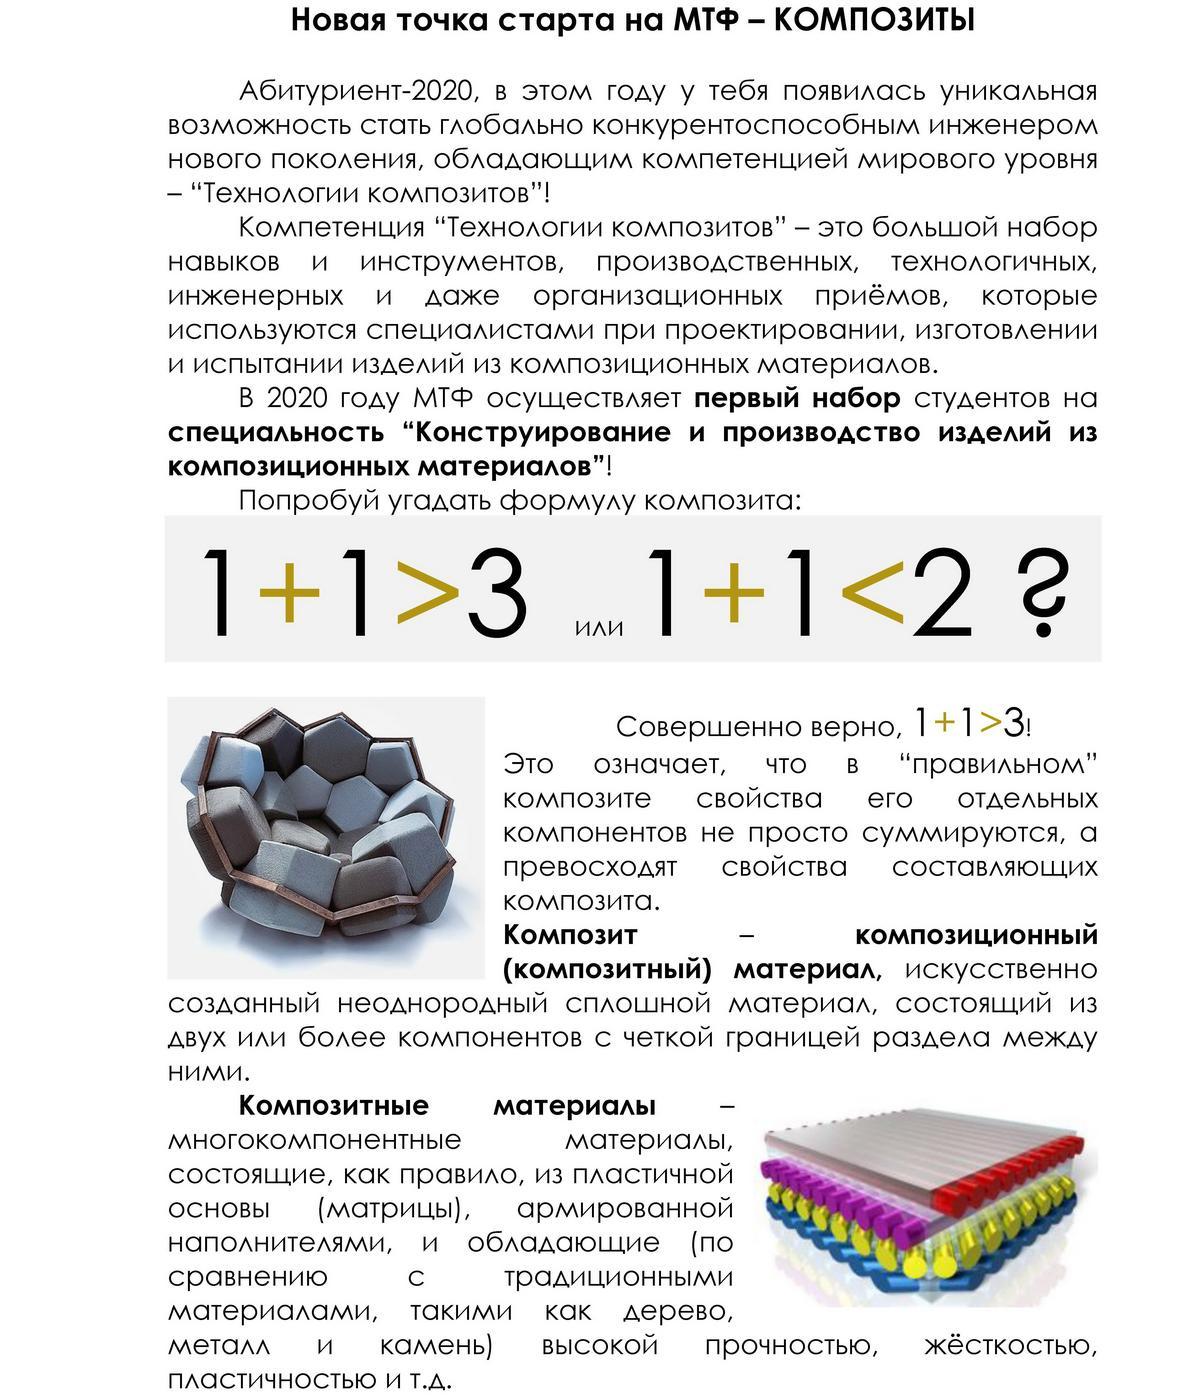 novaya_tochka_starta_na_mtf_stranica_1.jpg